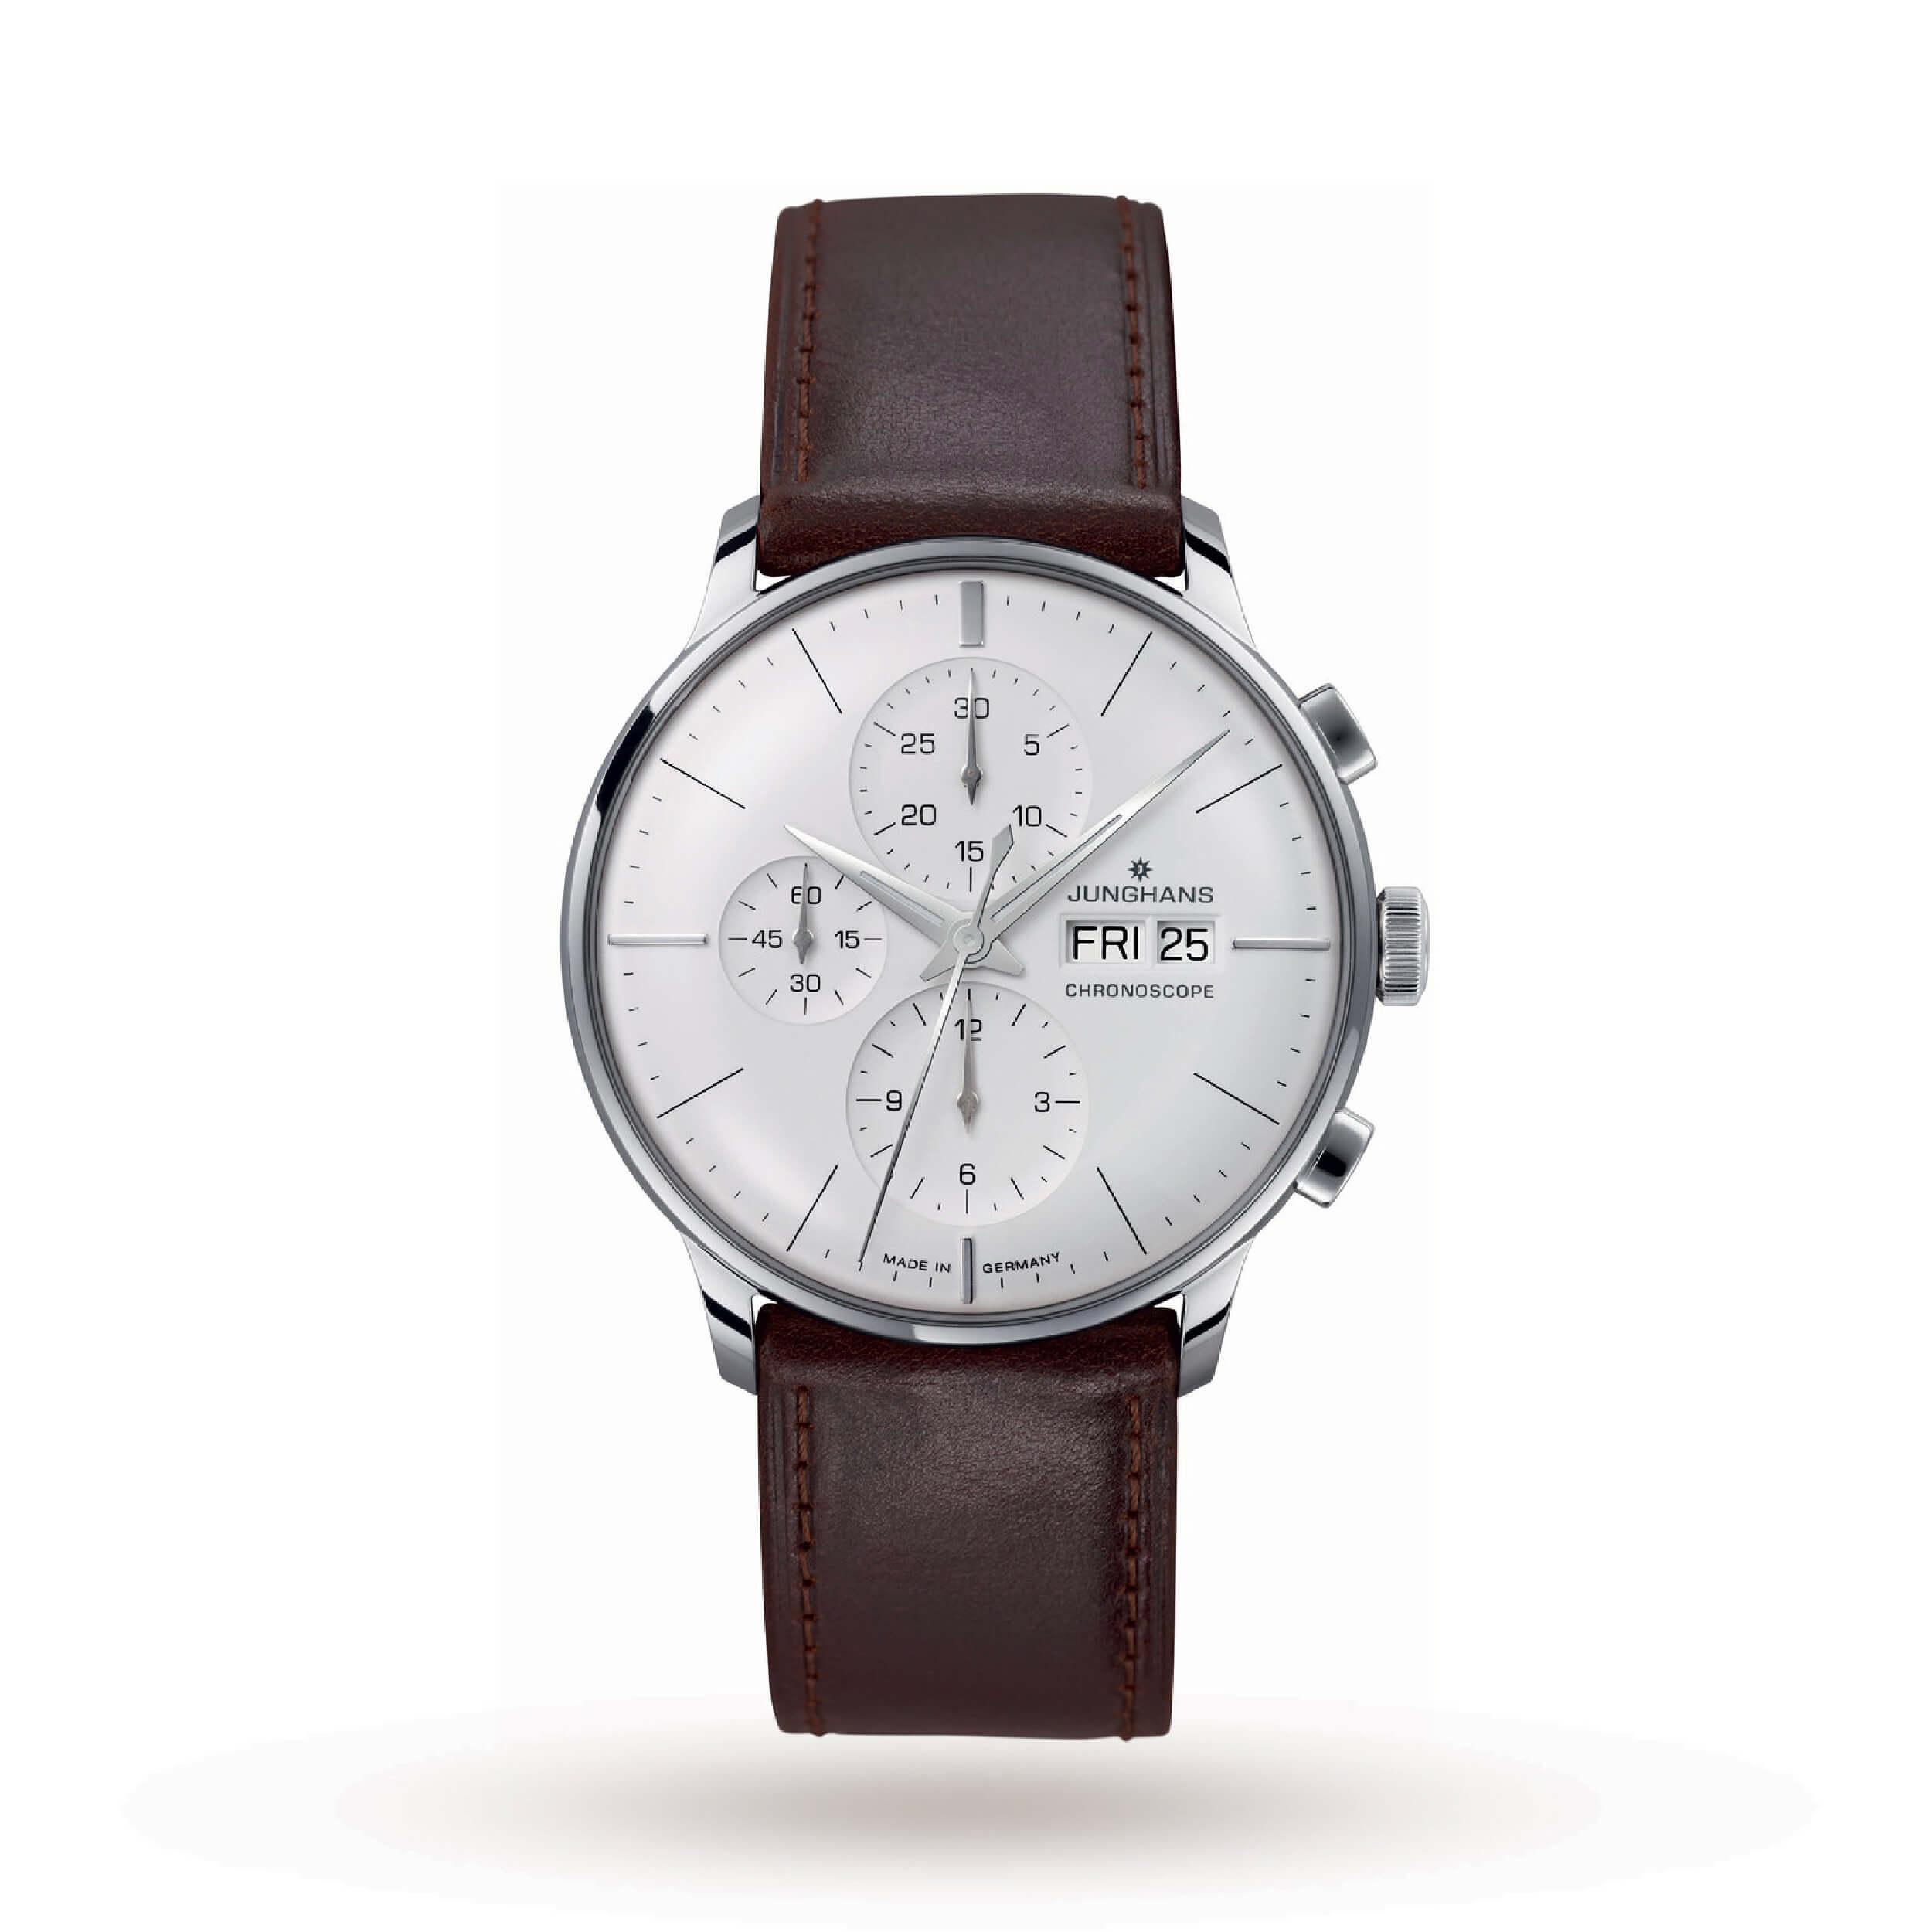 Junghans Unisex Meister Chronoscope Automatic Chronograph | Best Chronograph Watches Under 2000